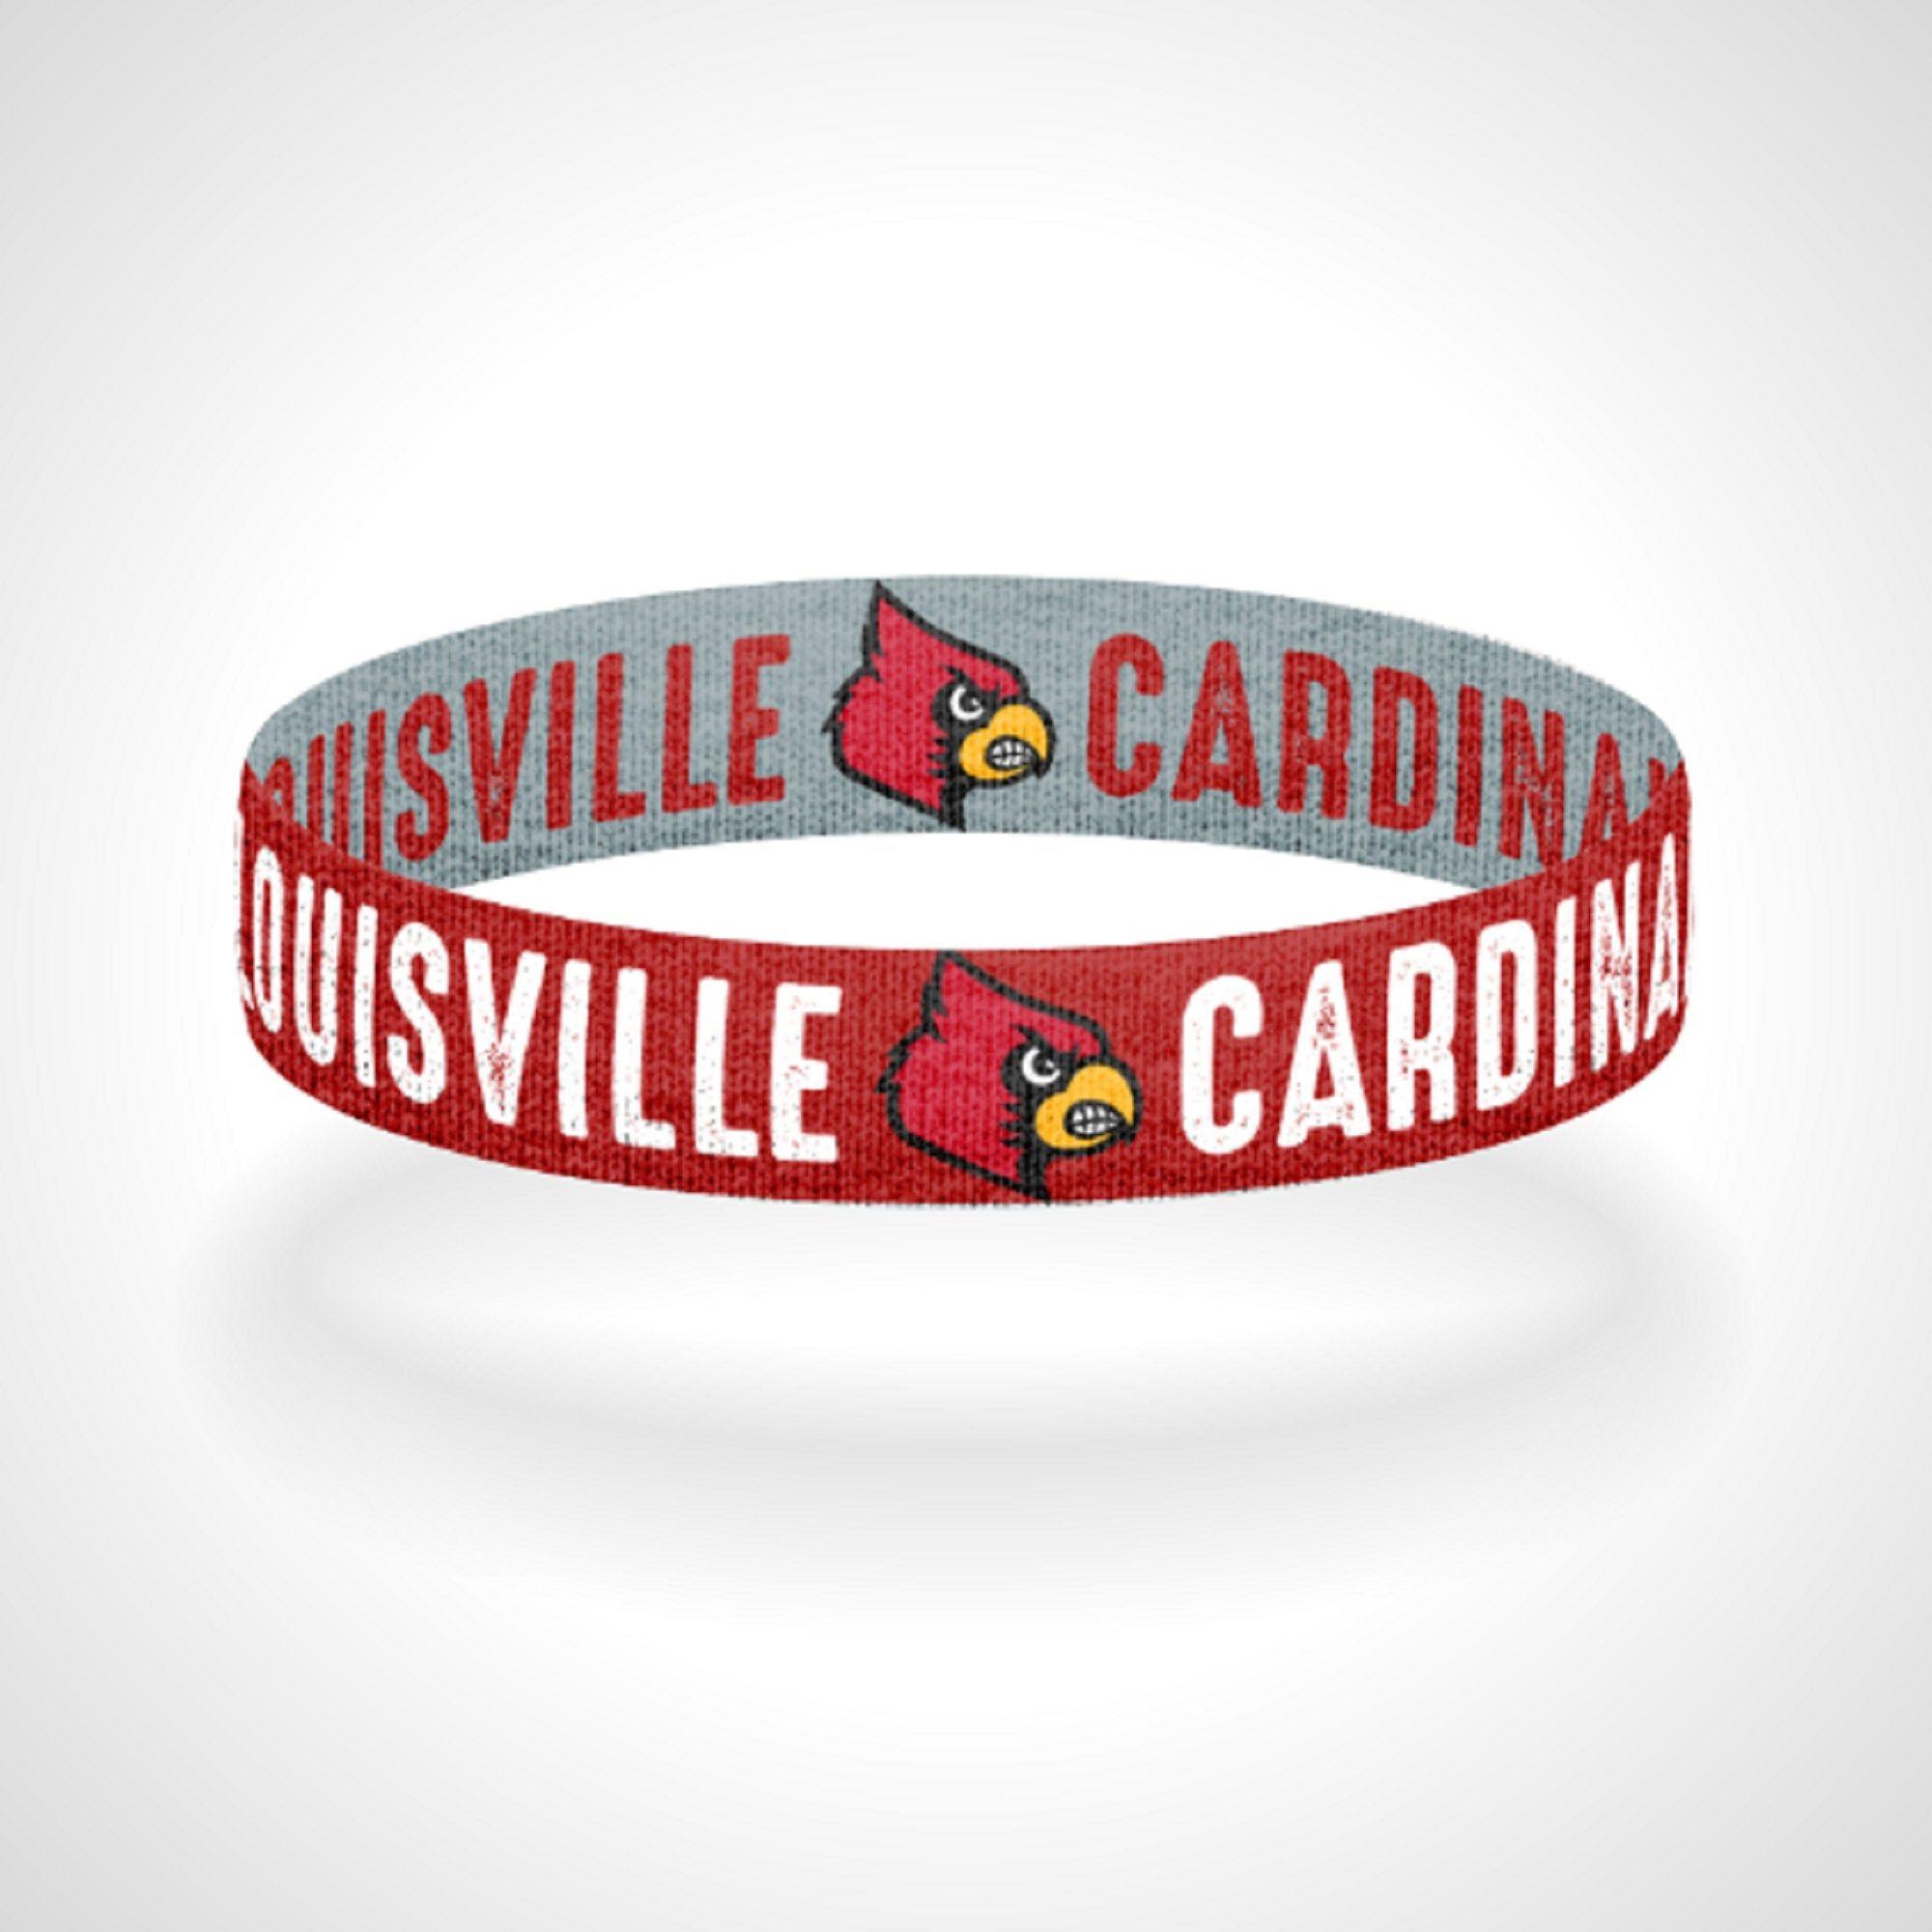 Louisville Cardinals Bracelet Wristband